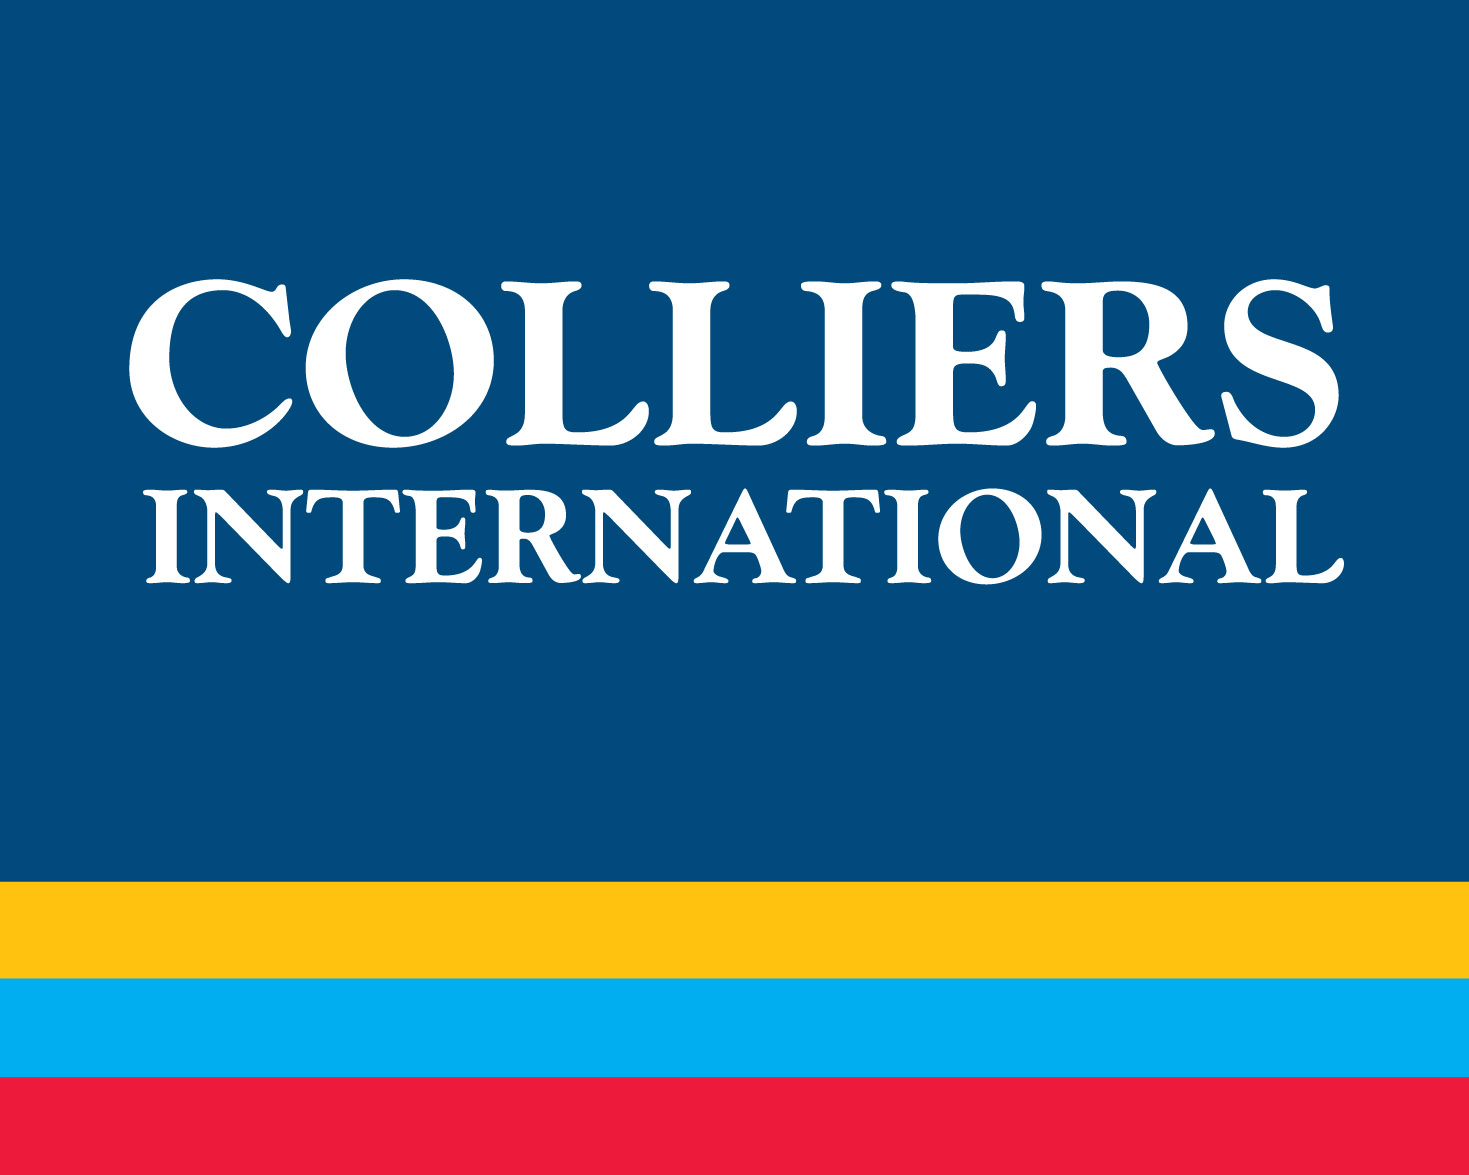 COLLIERS LOGO.jpg